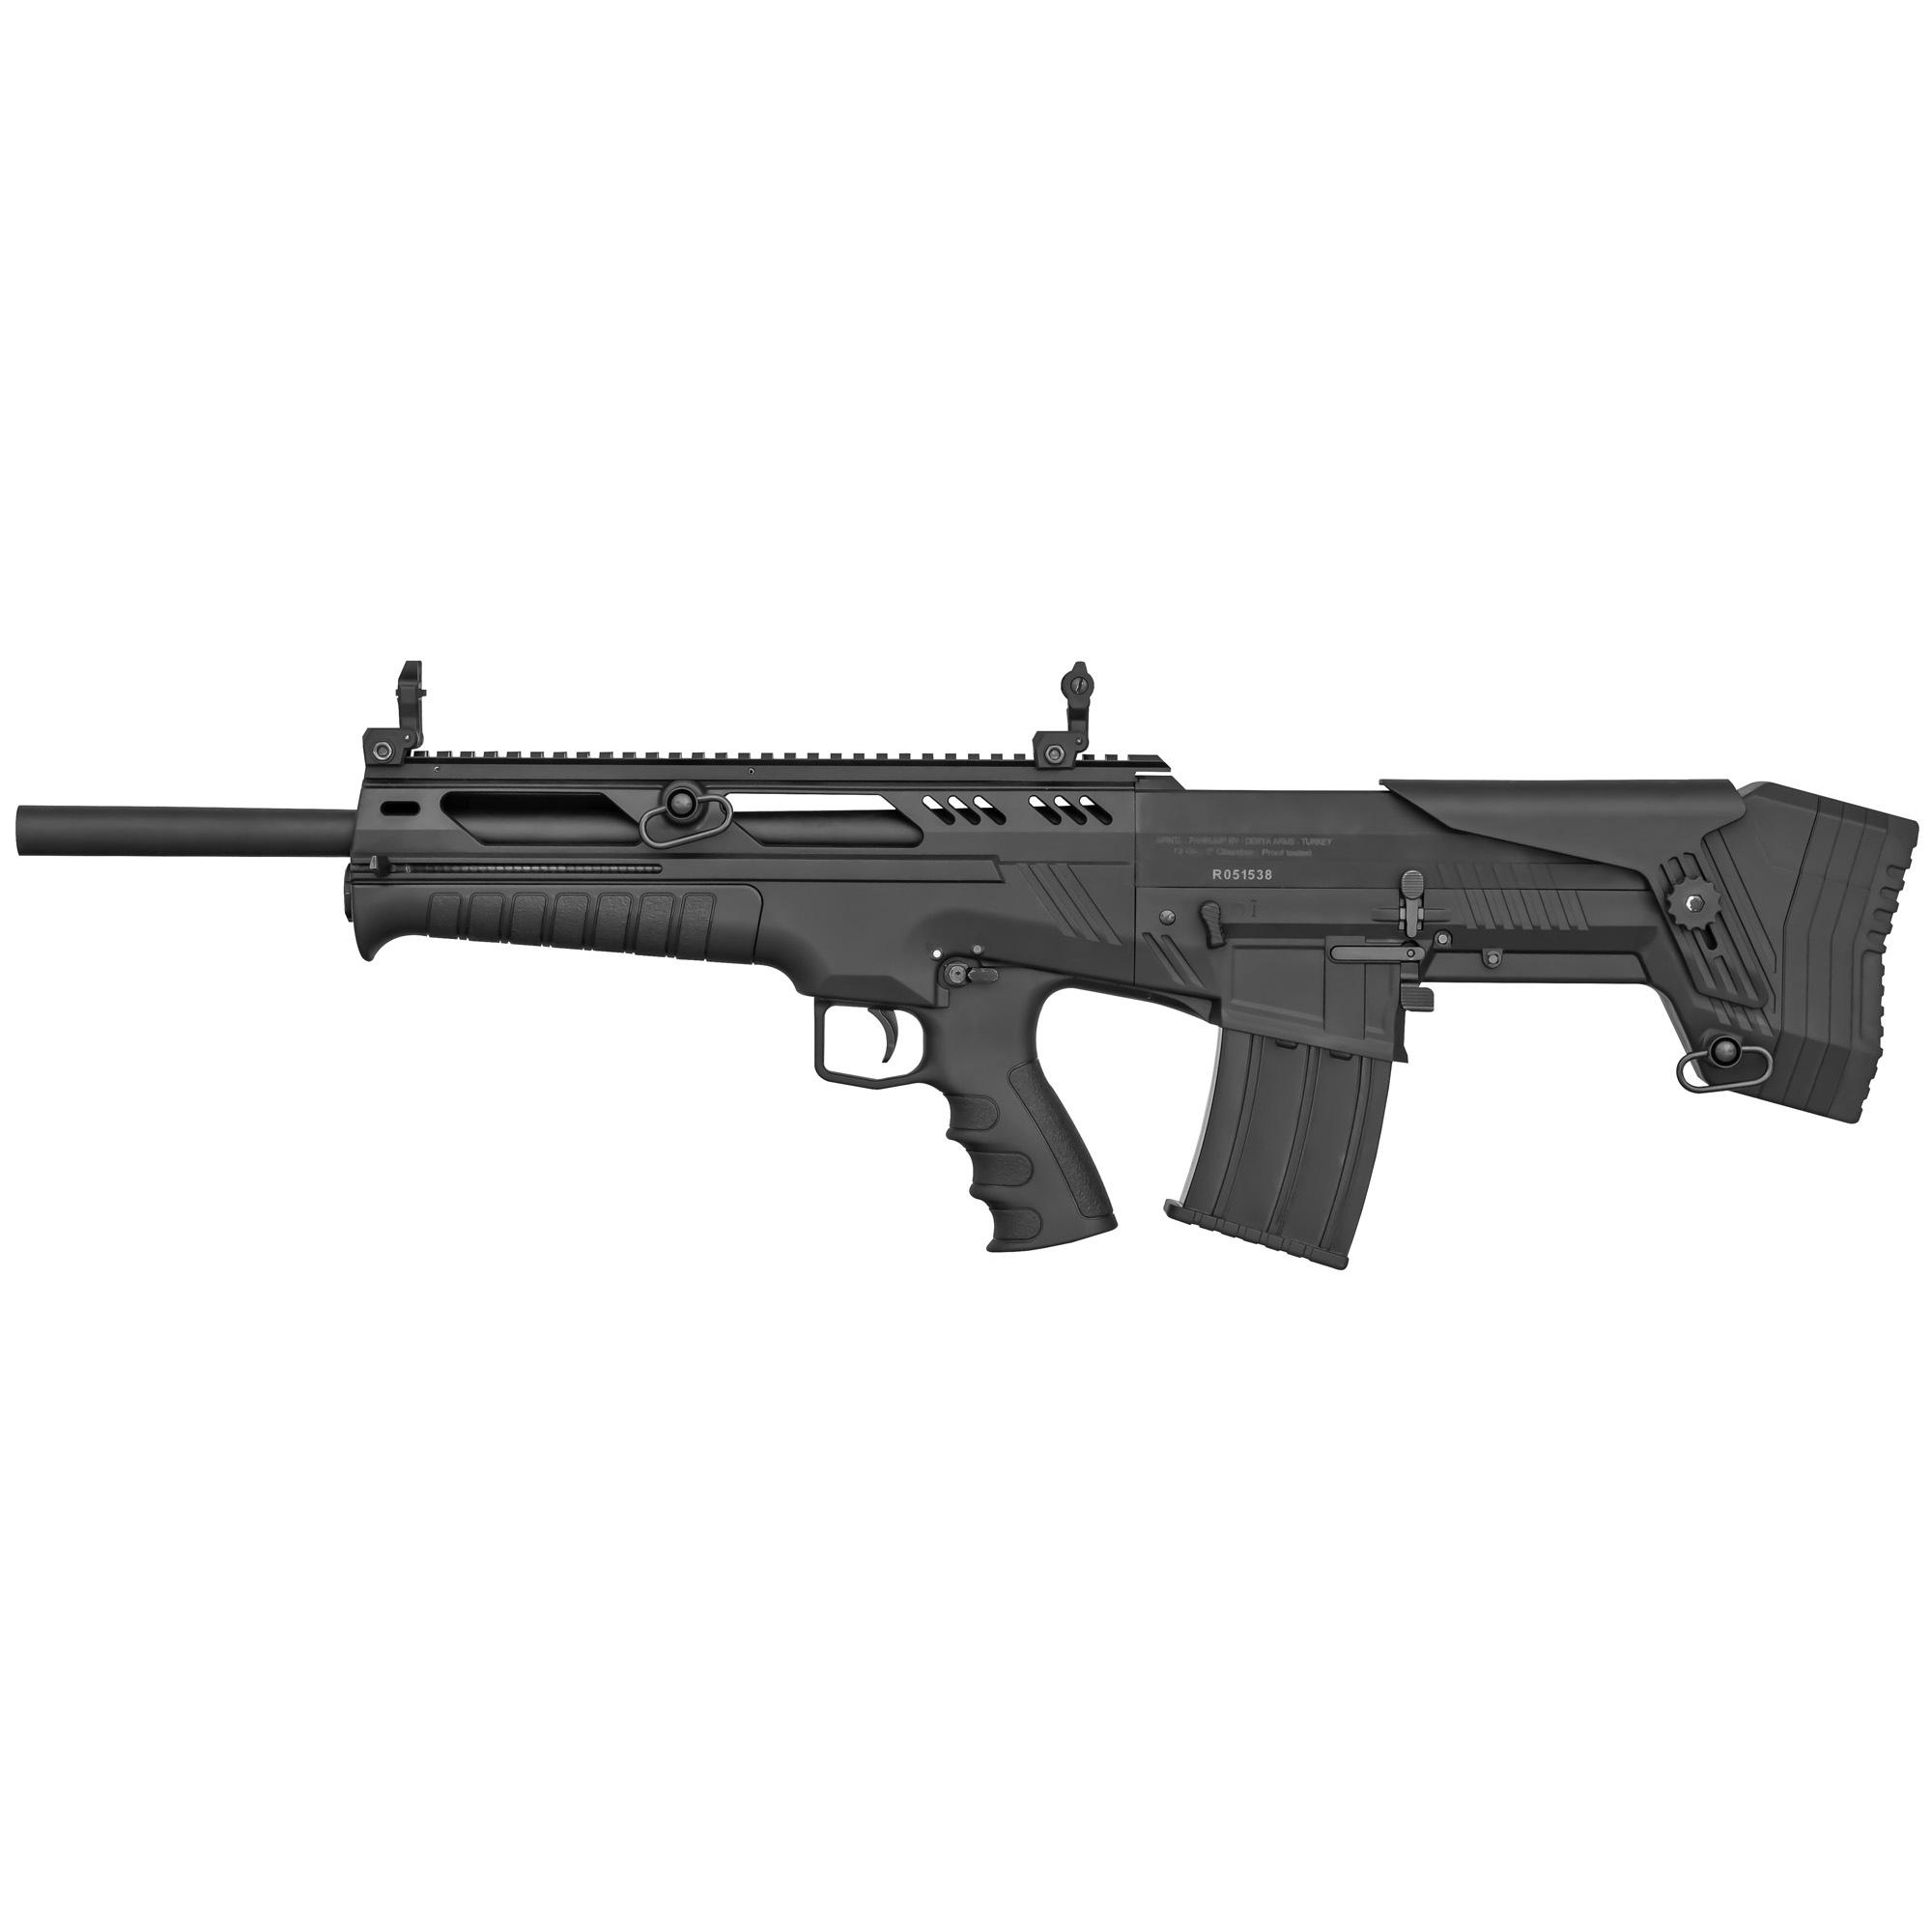 Rock Island Armory VRBP-100 12ga Bullpup Shotgun · DK Firearms